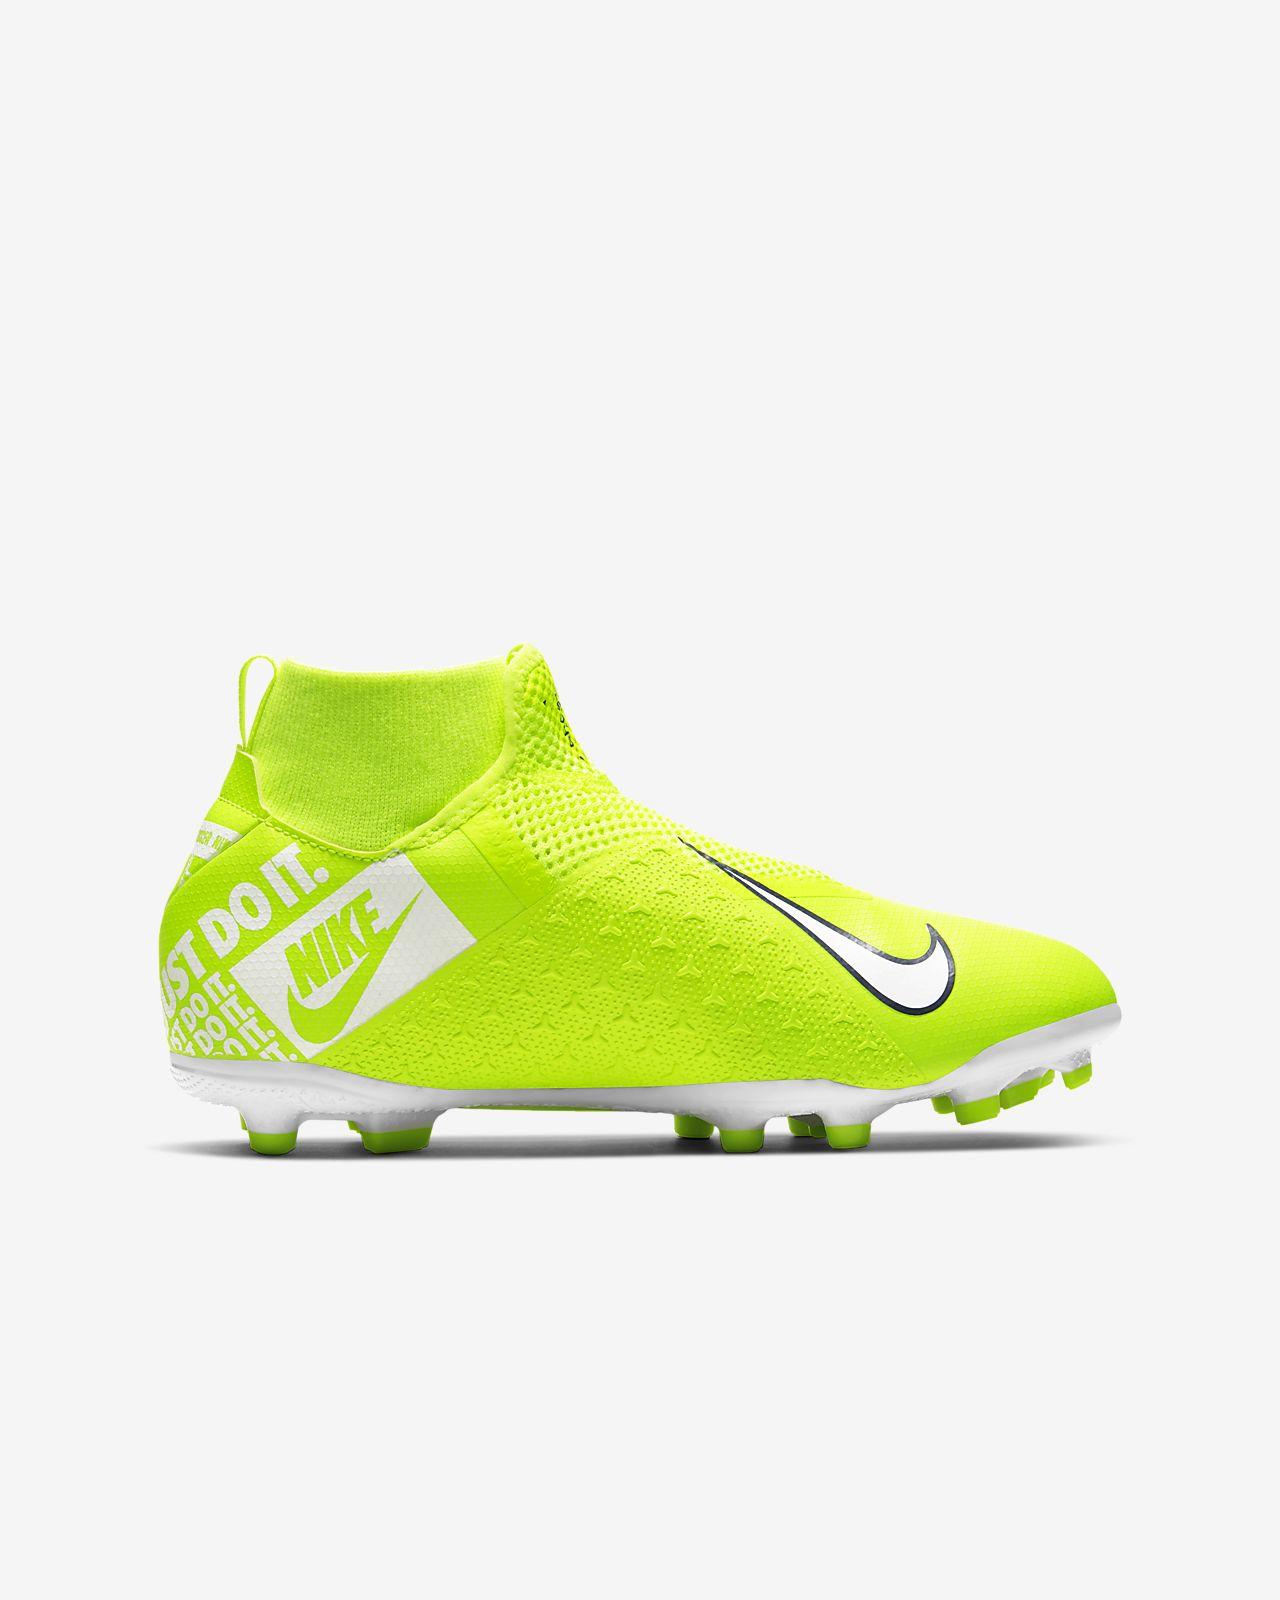 741b94613e Nike Jr. Phantom Vision Academy Dynamic Fit MG Little/Big Kids'  Multi-Ground Soccer Cleat